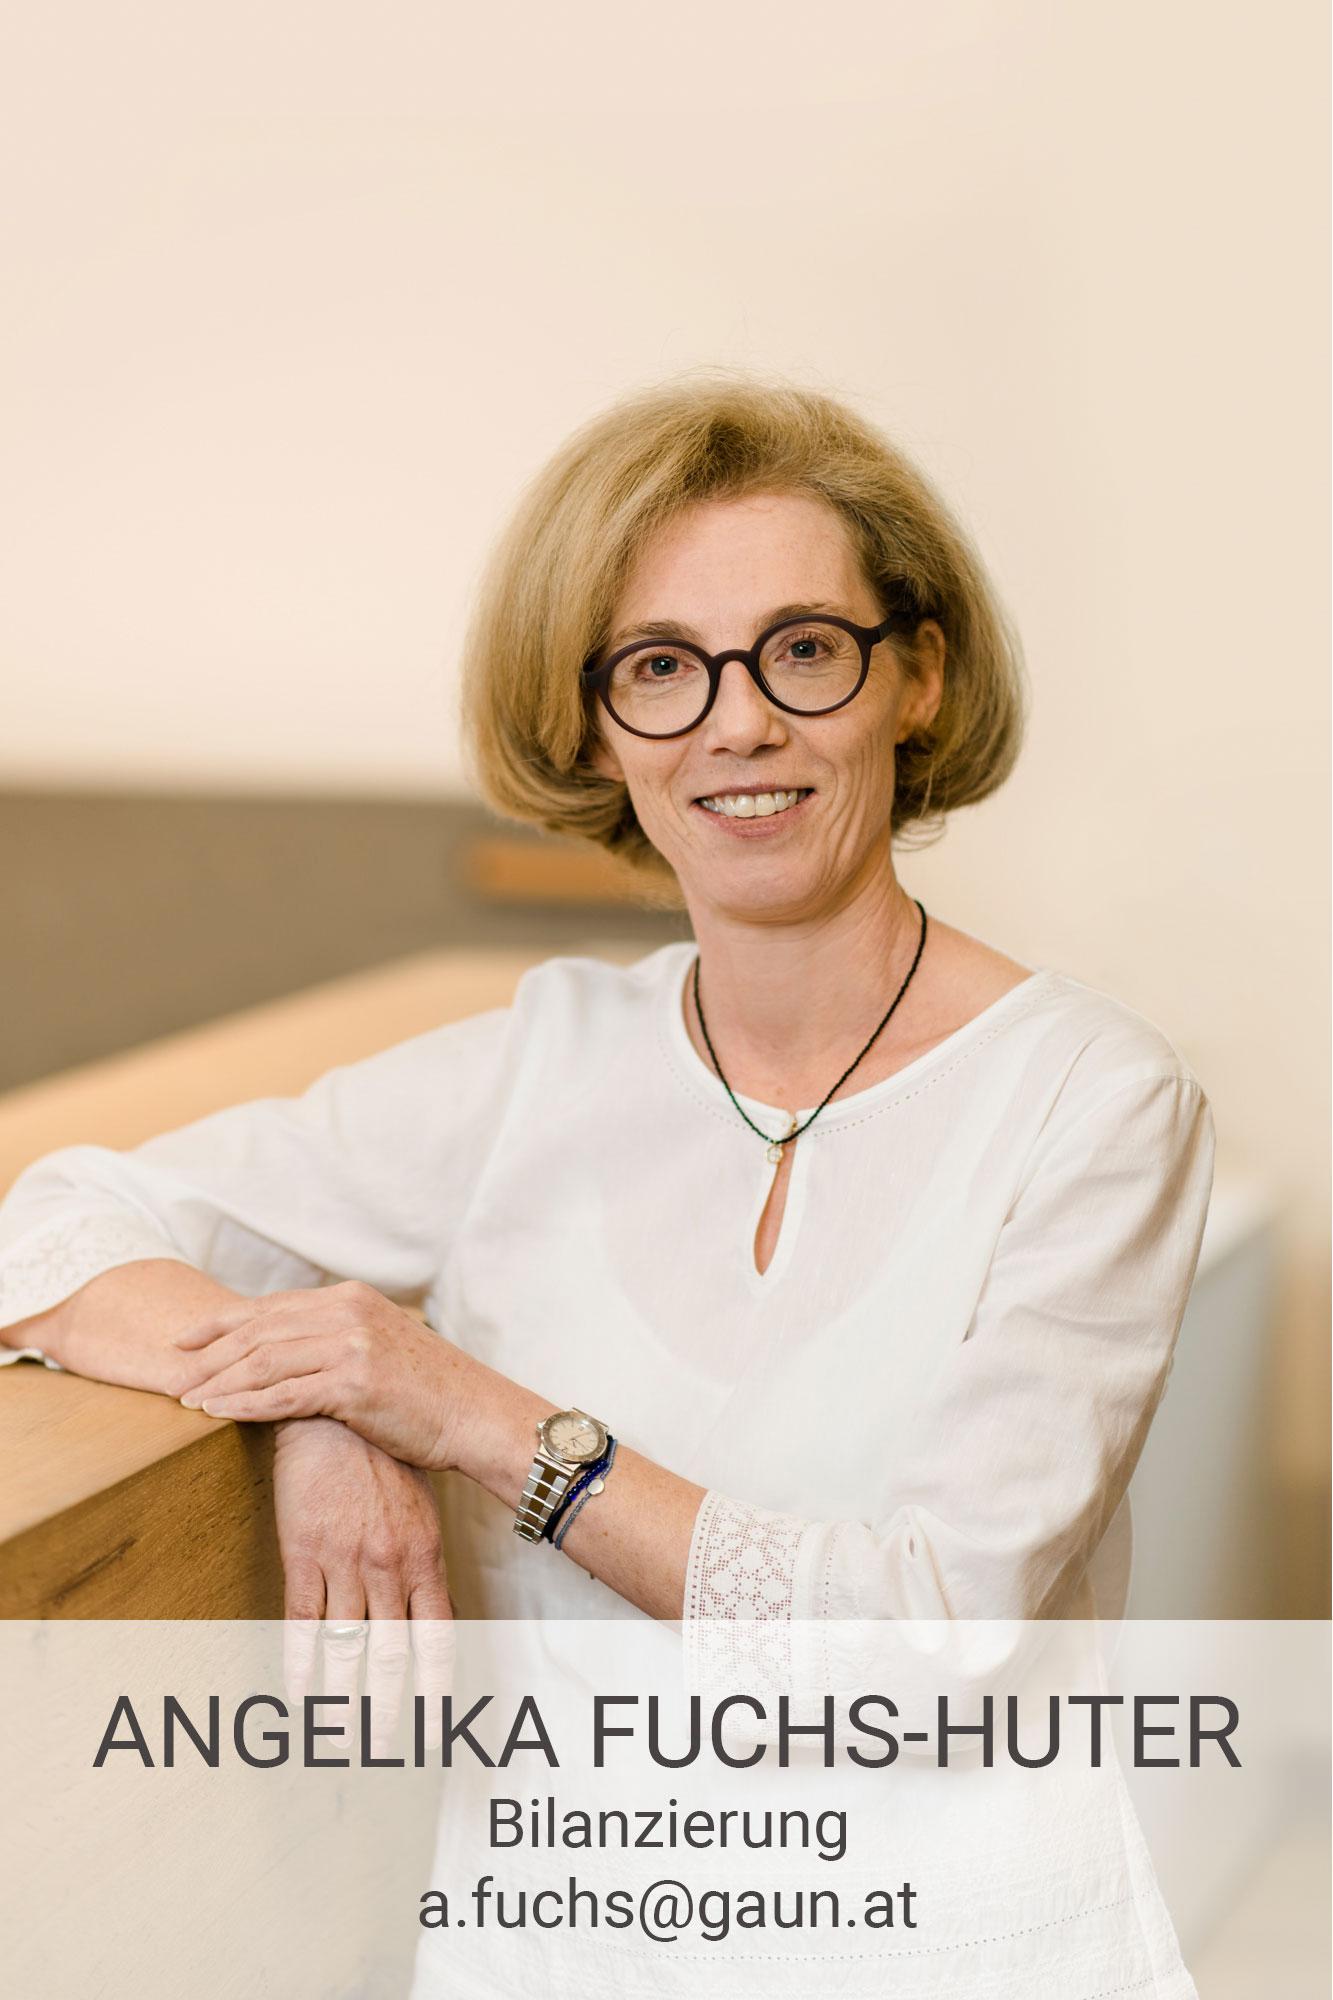 Angelika Fuchs-Huter